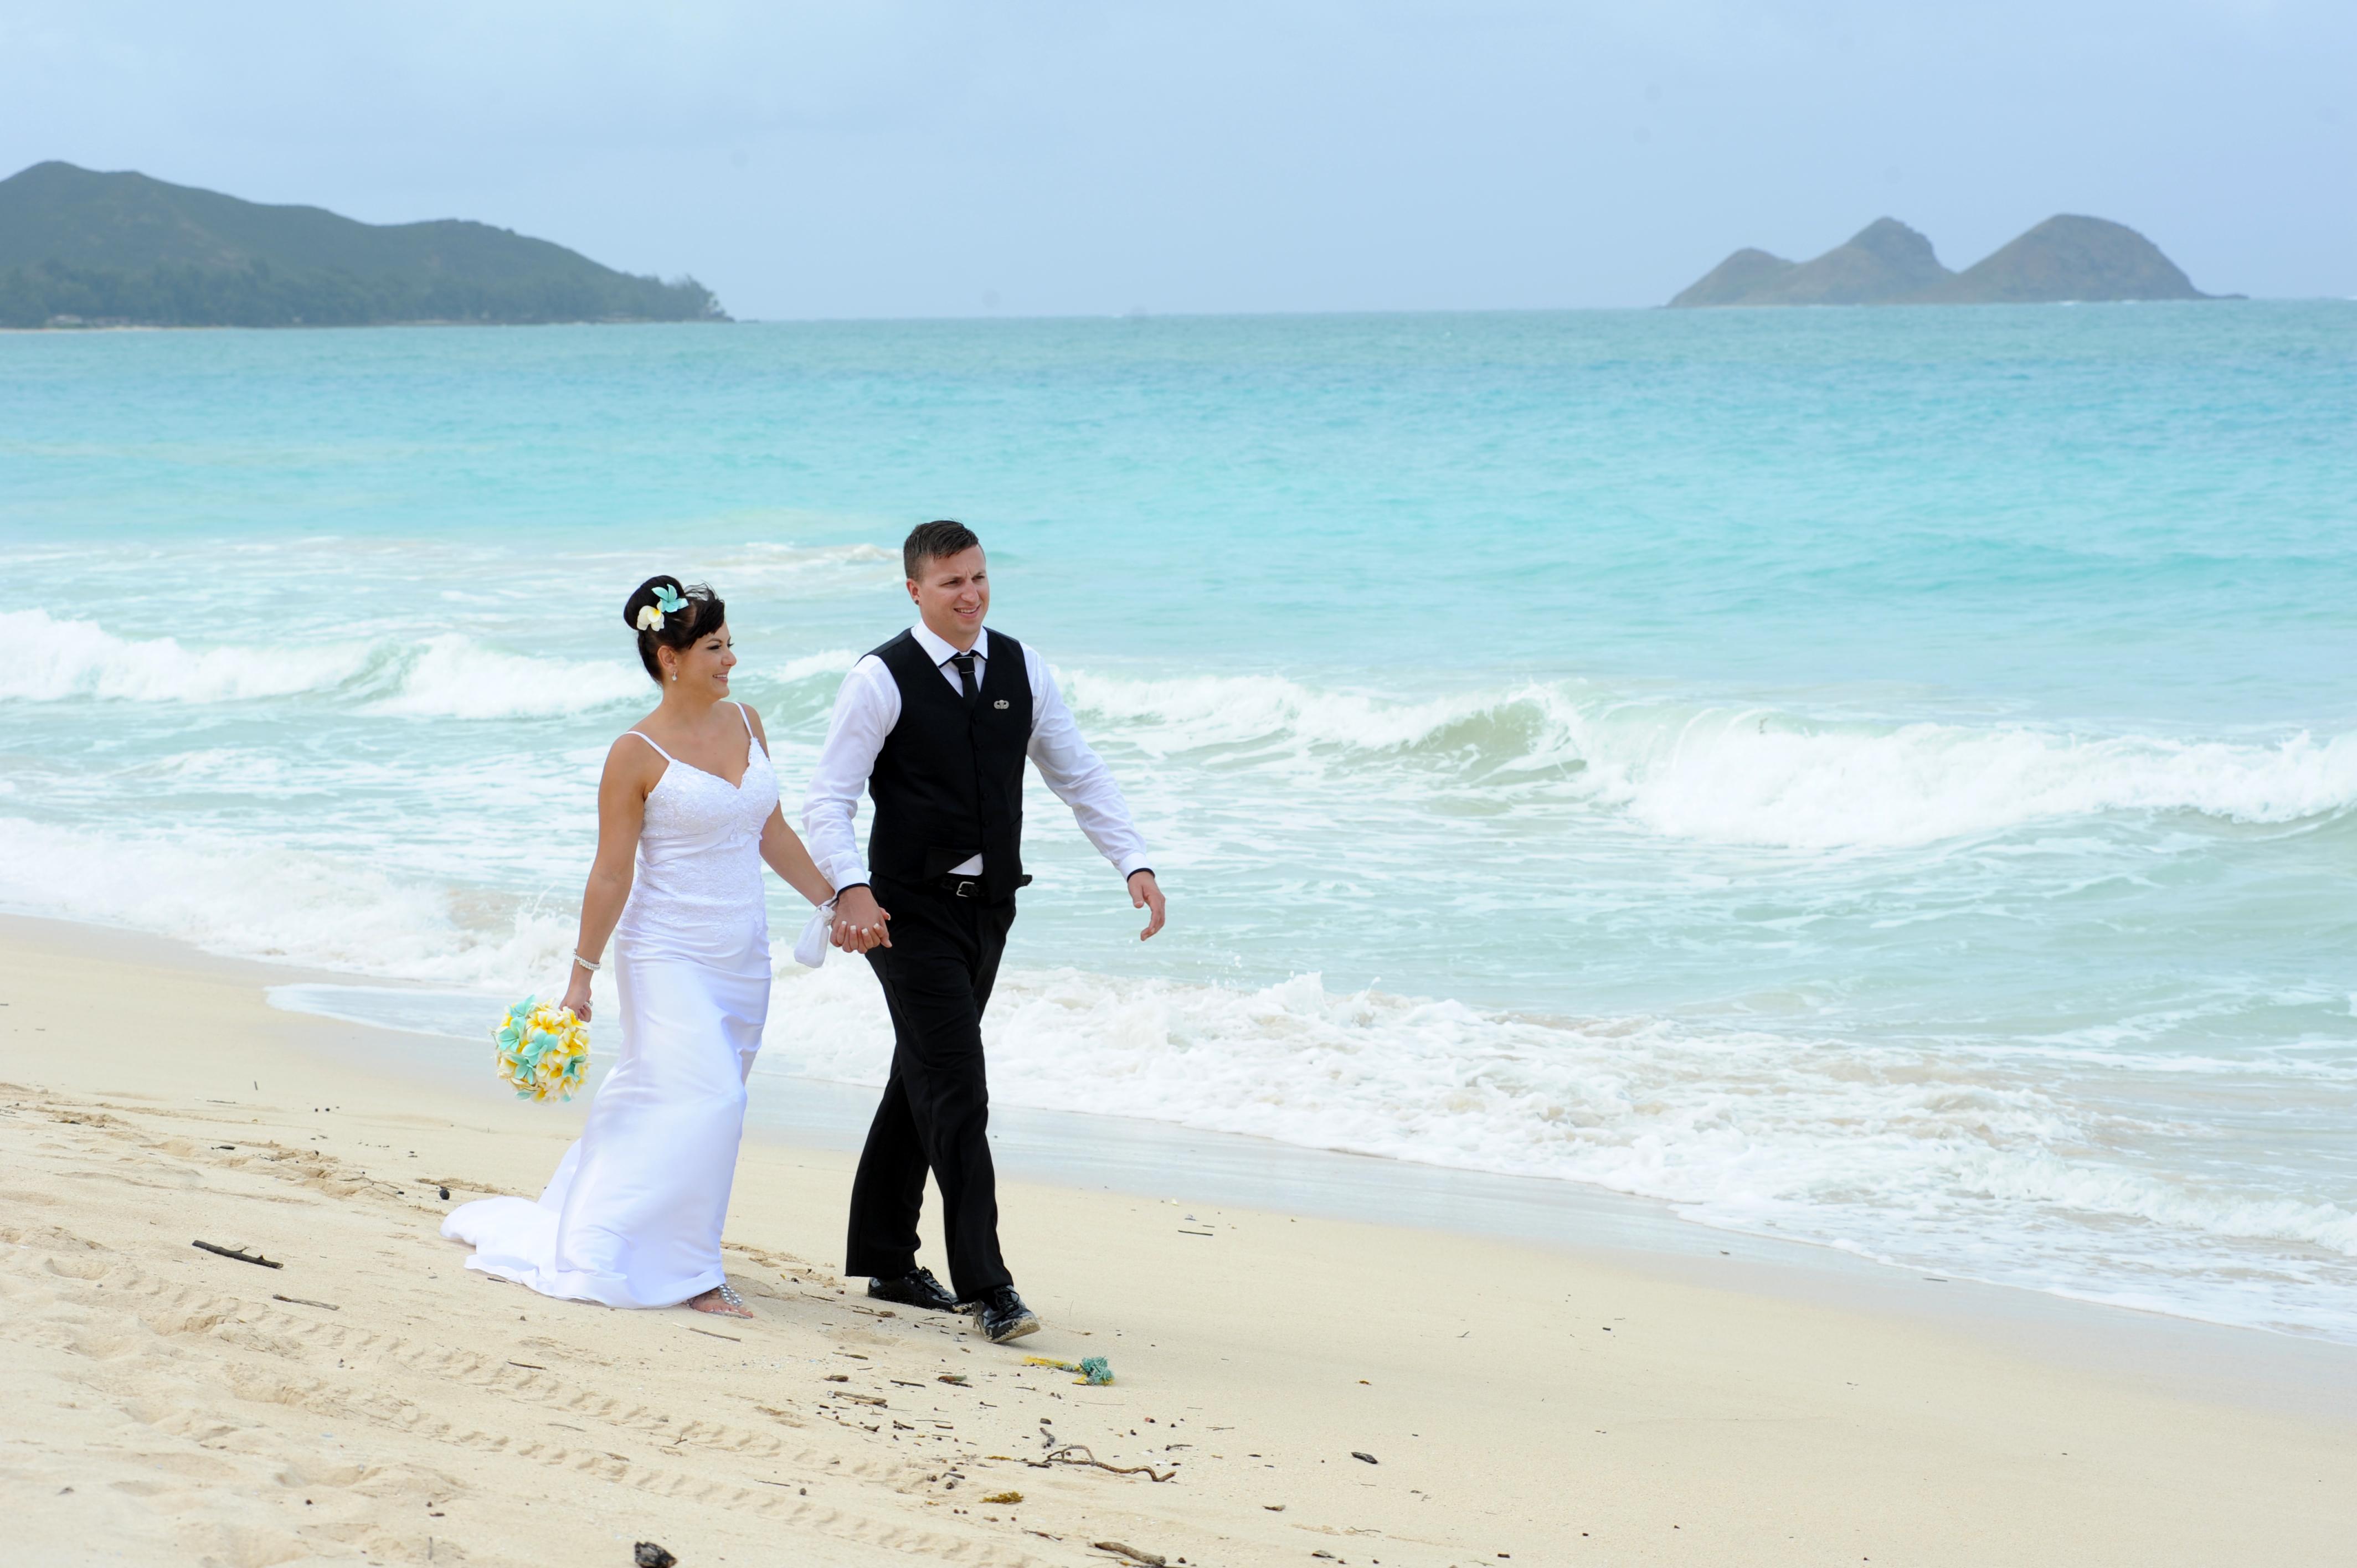 Alohaislandweddings.com- Wedding Picture in Hawaii-37